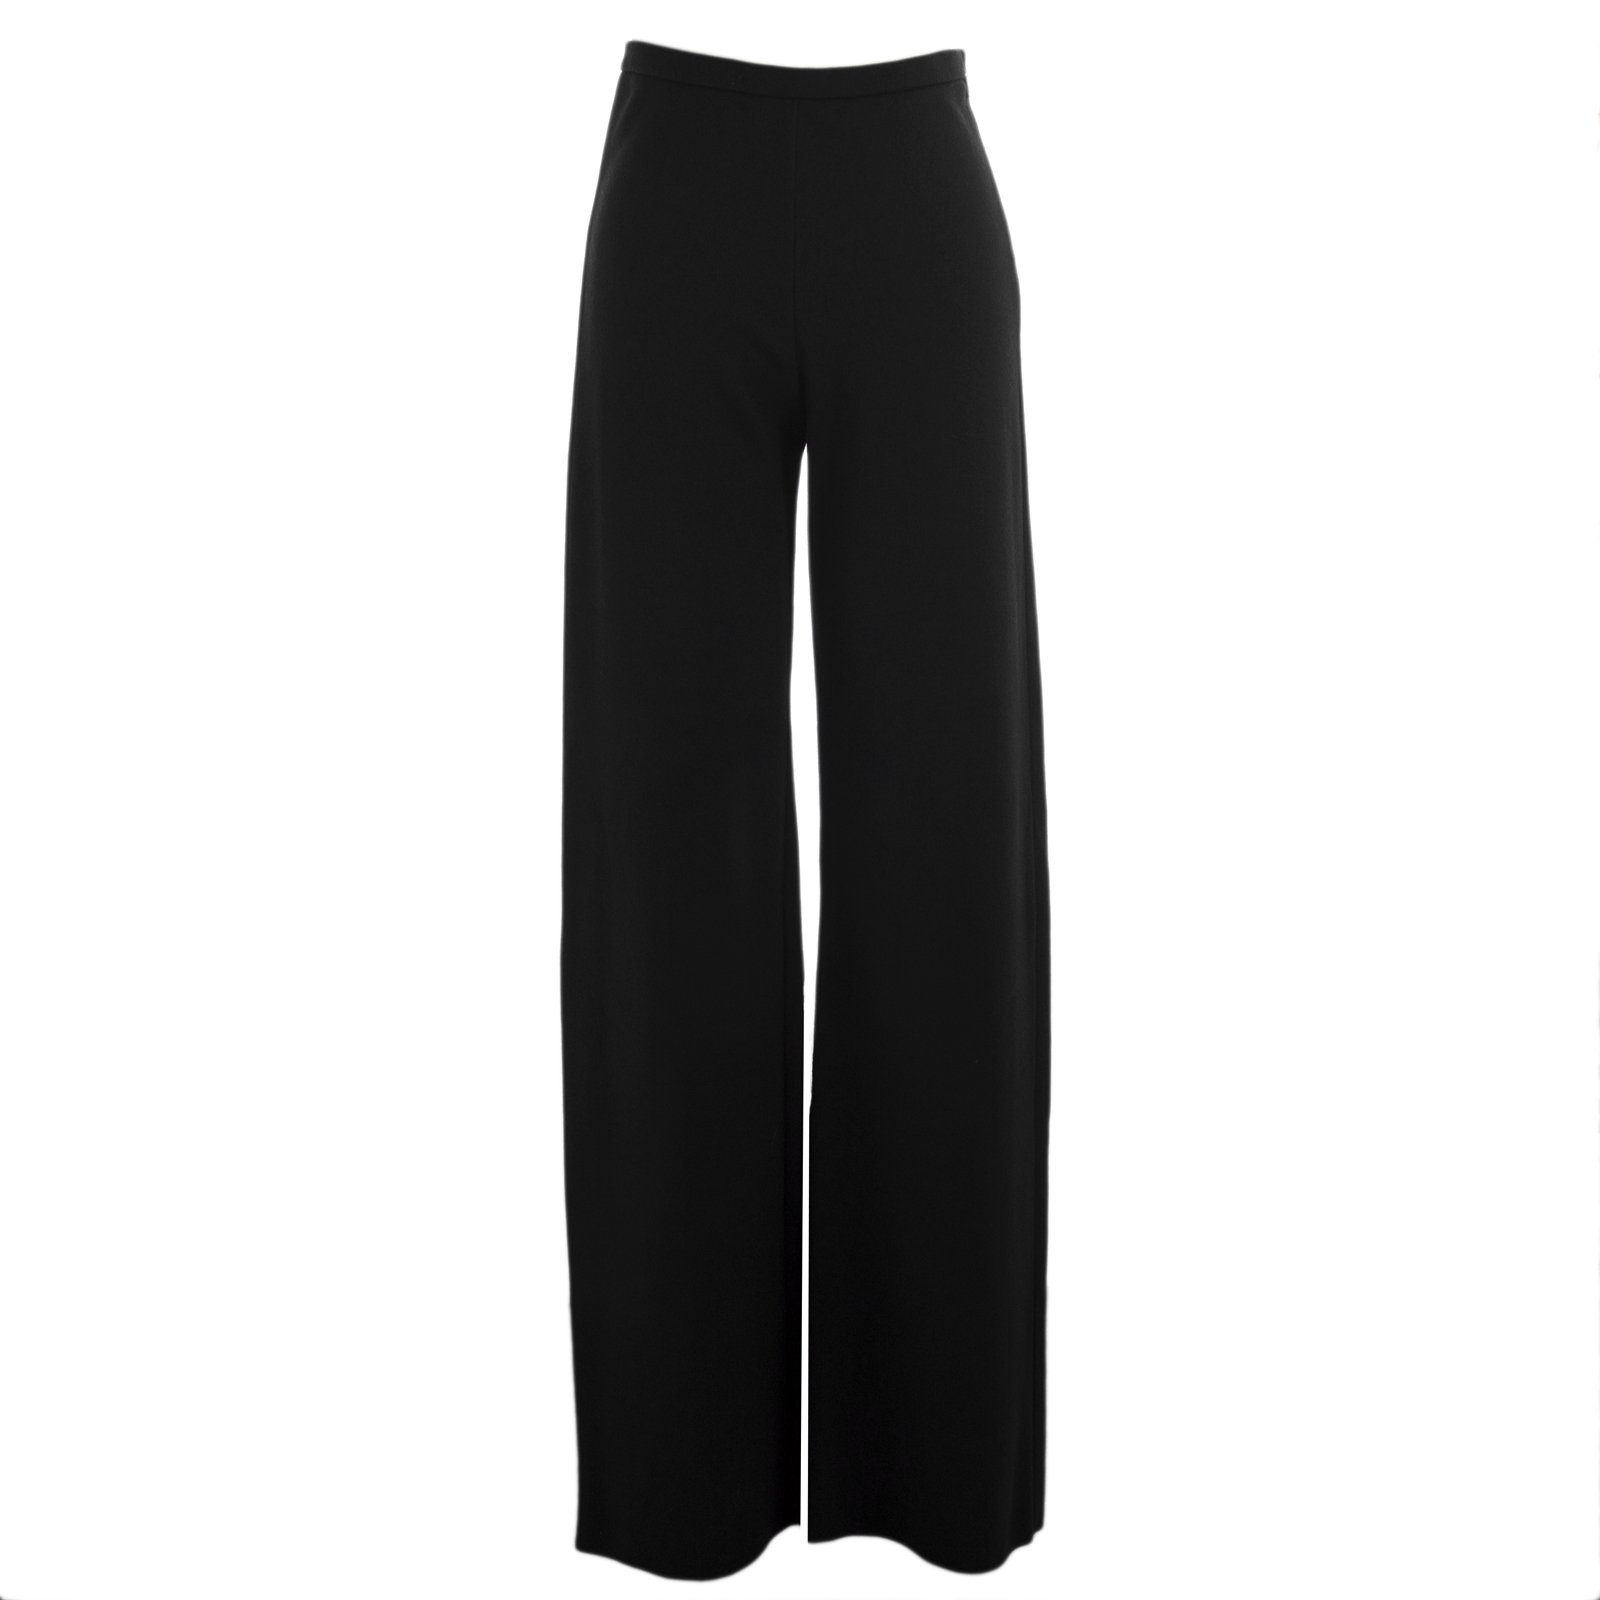 Max Mara Women's Afoso Wide Leg Wool Trousers Sz 14 Black